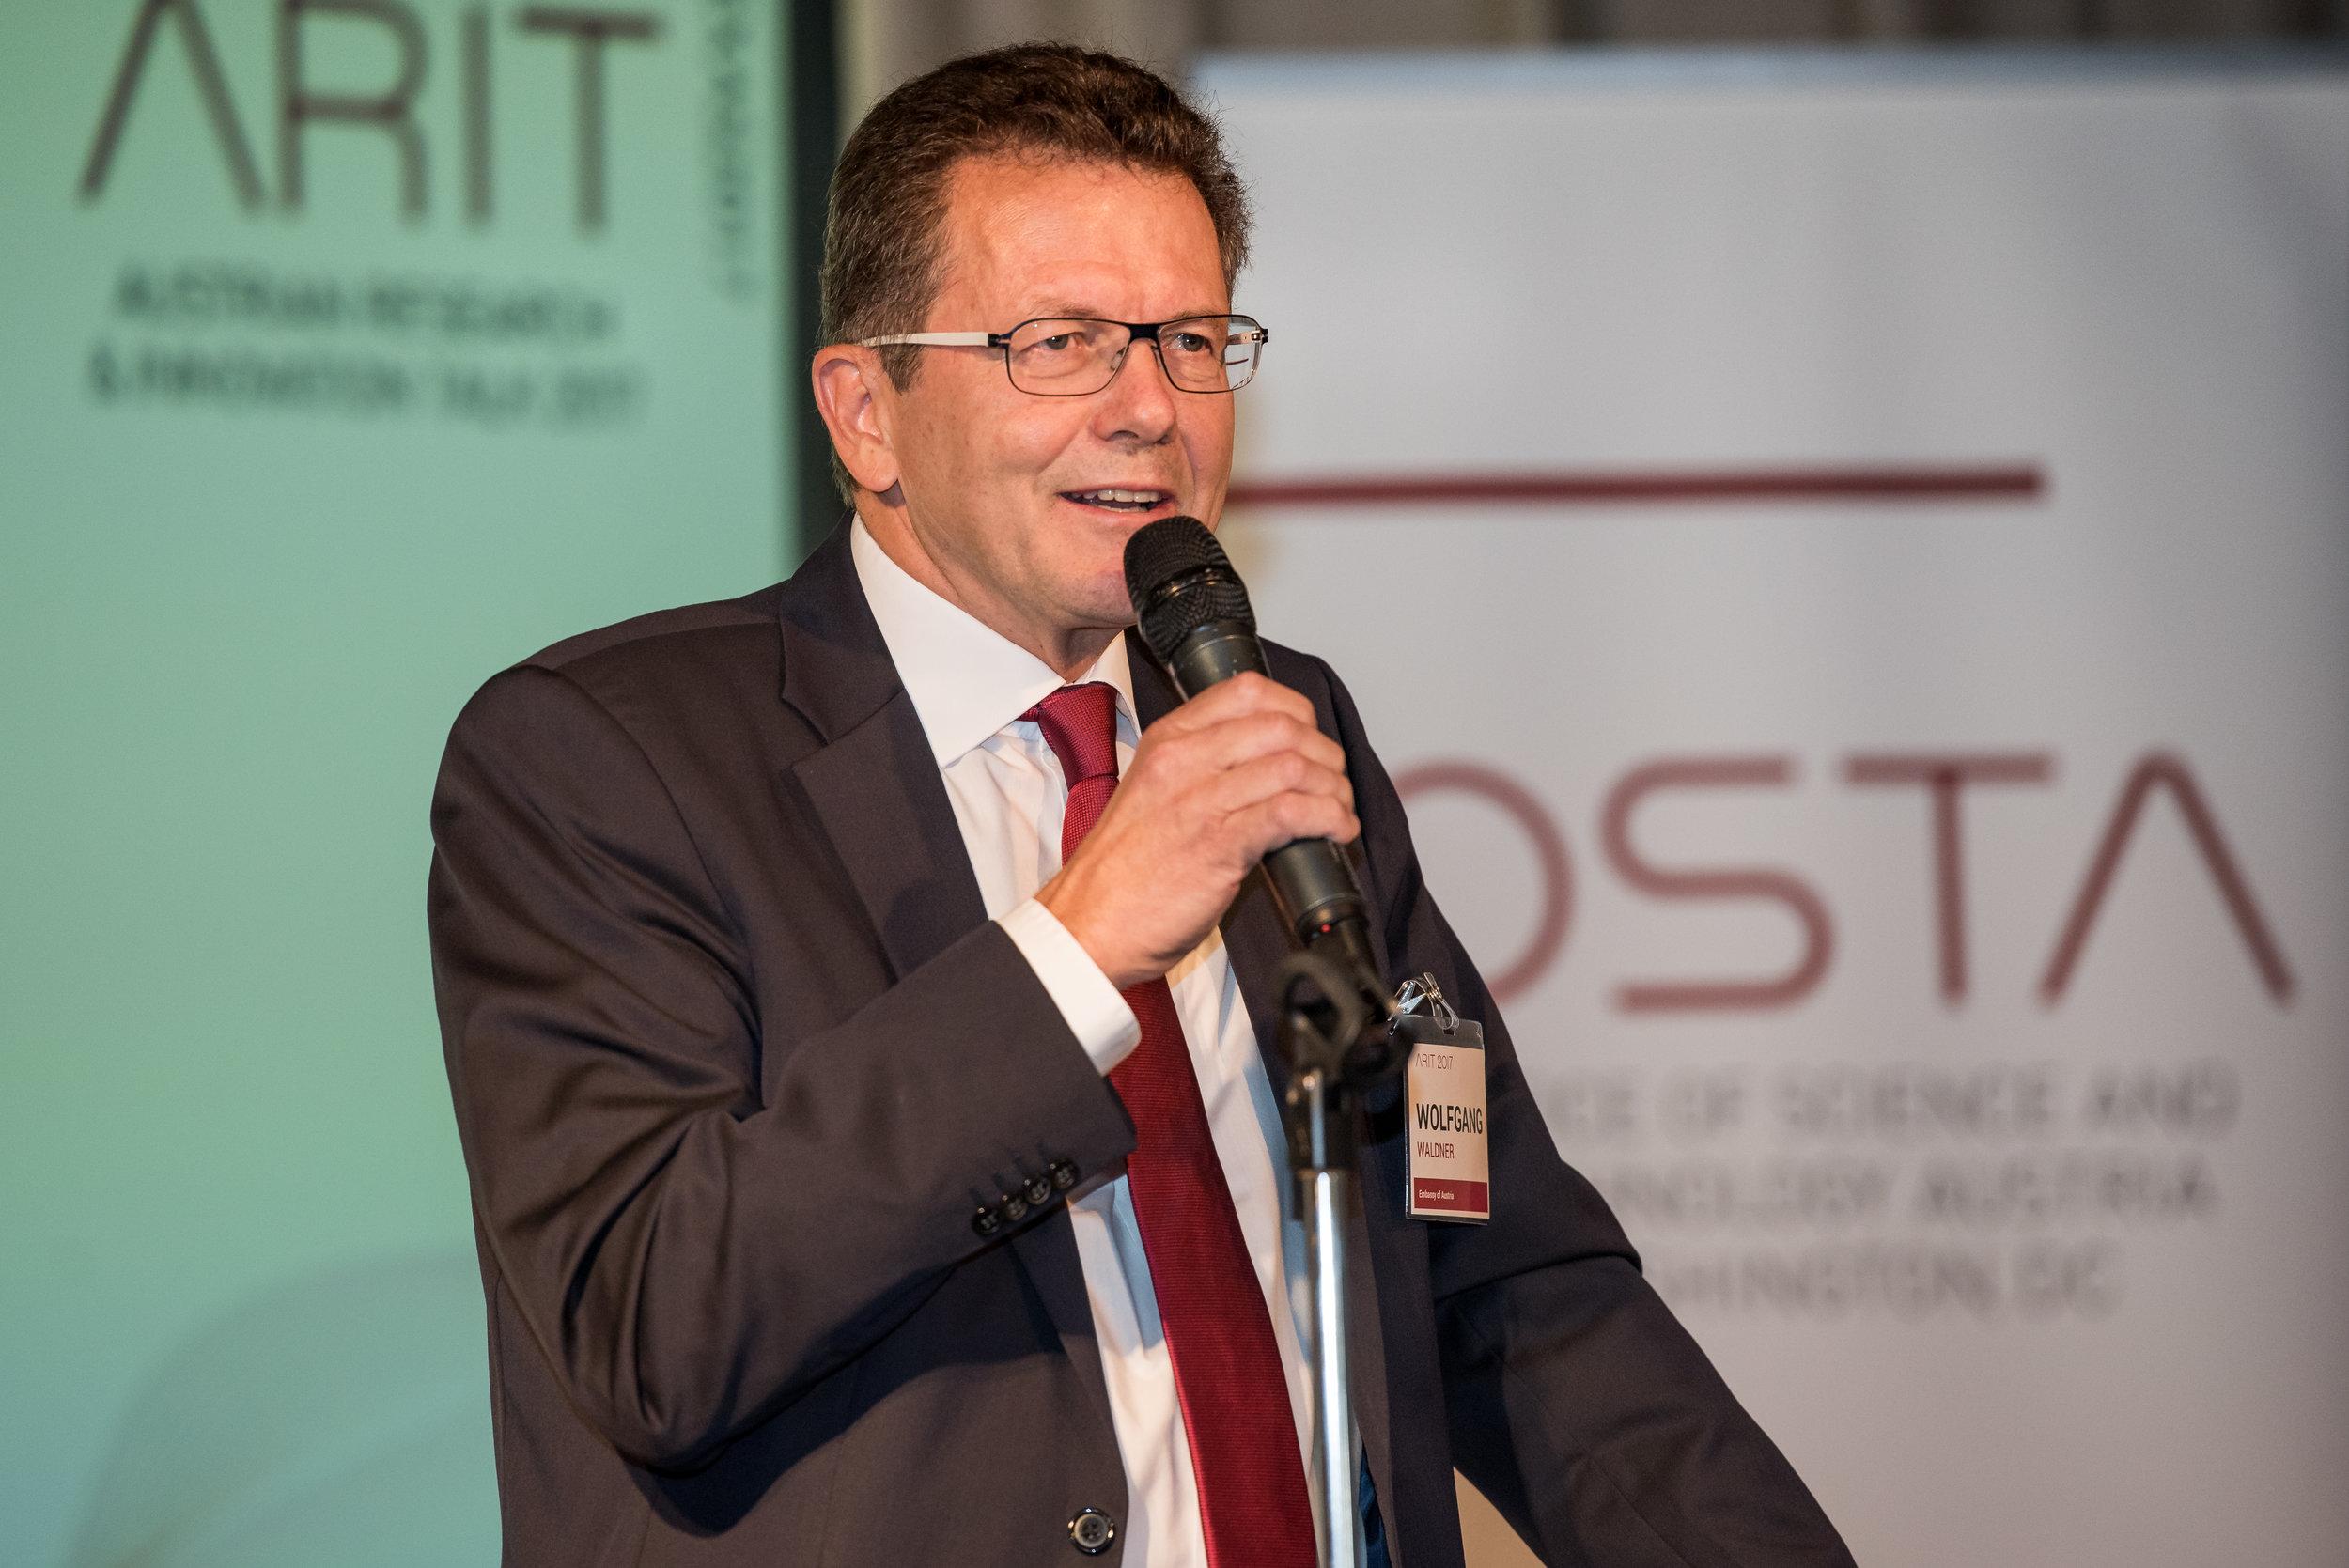 Ambassador Wolfgang Waldner giving the opening remarks of ARIT 2017